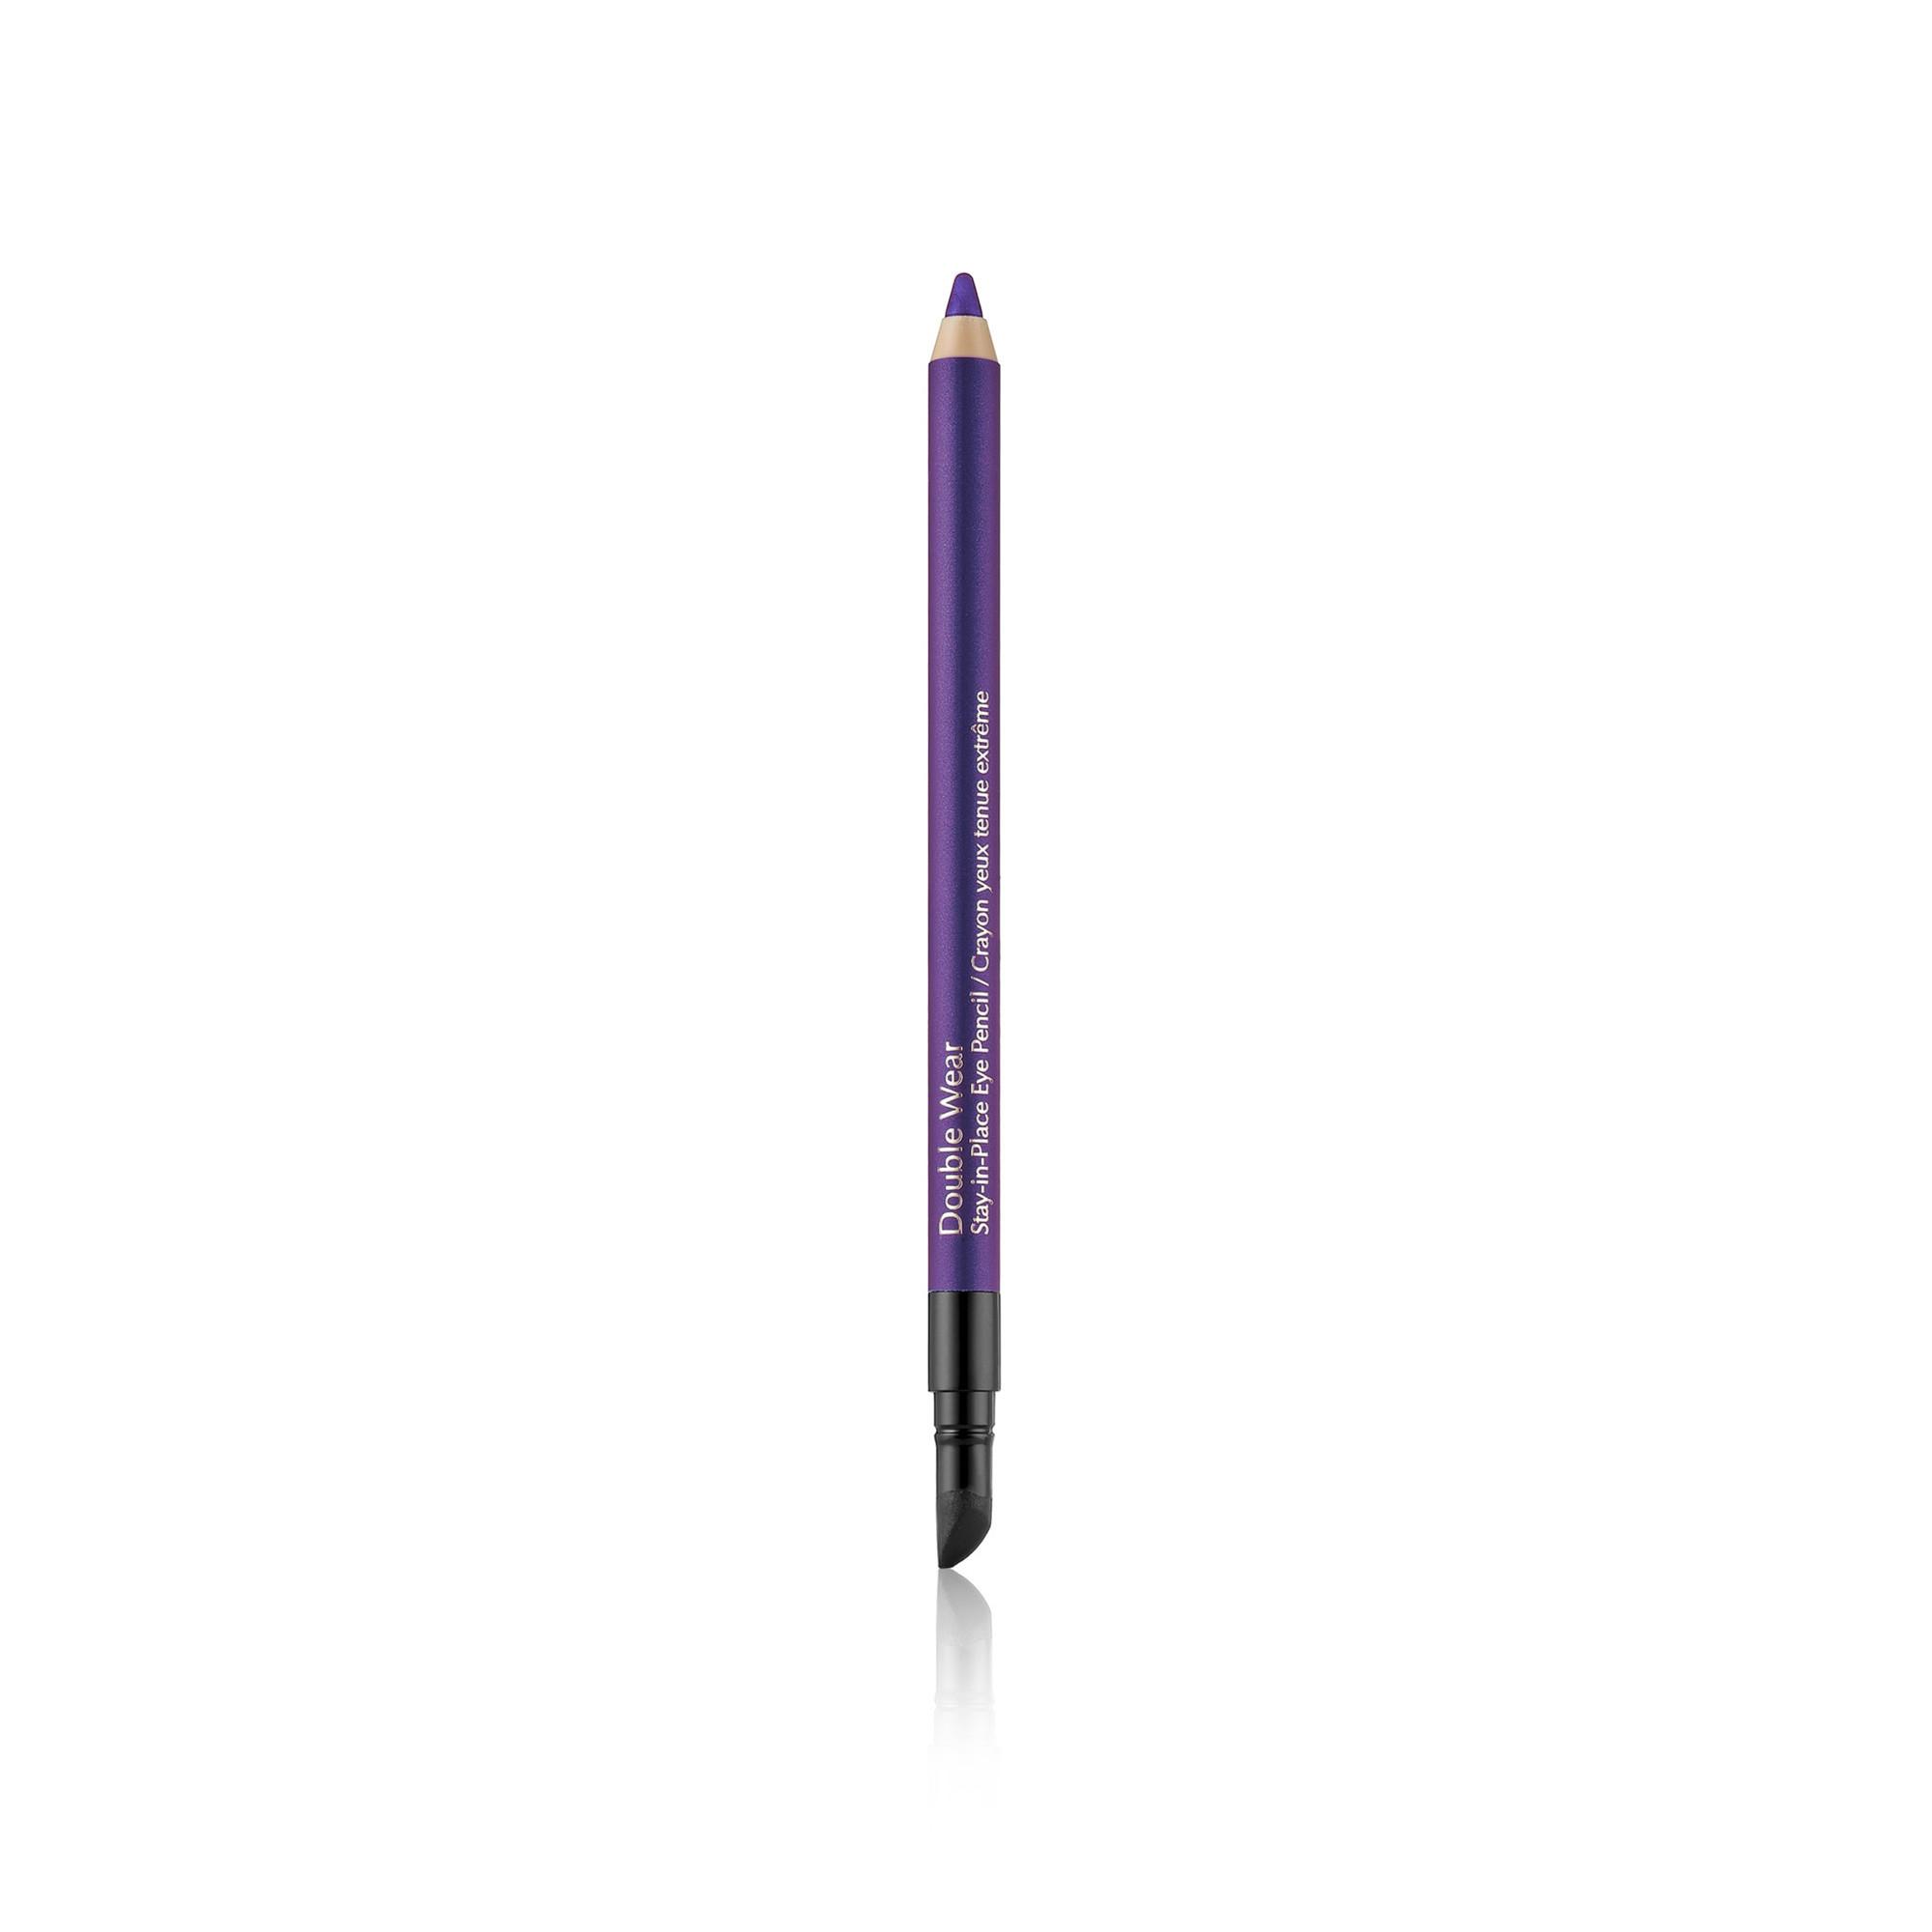 Estée Lauder double wear stay-in-place eye pencils  night violet 1,2 g, NIGHT VIOLET, large image number 0